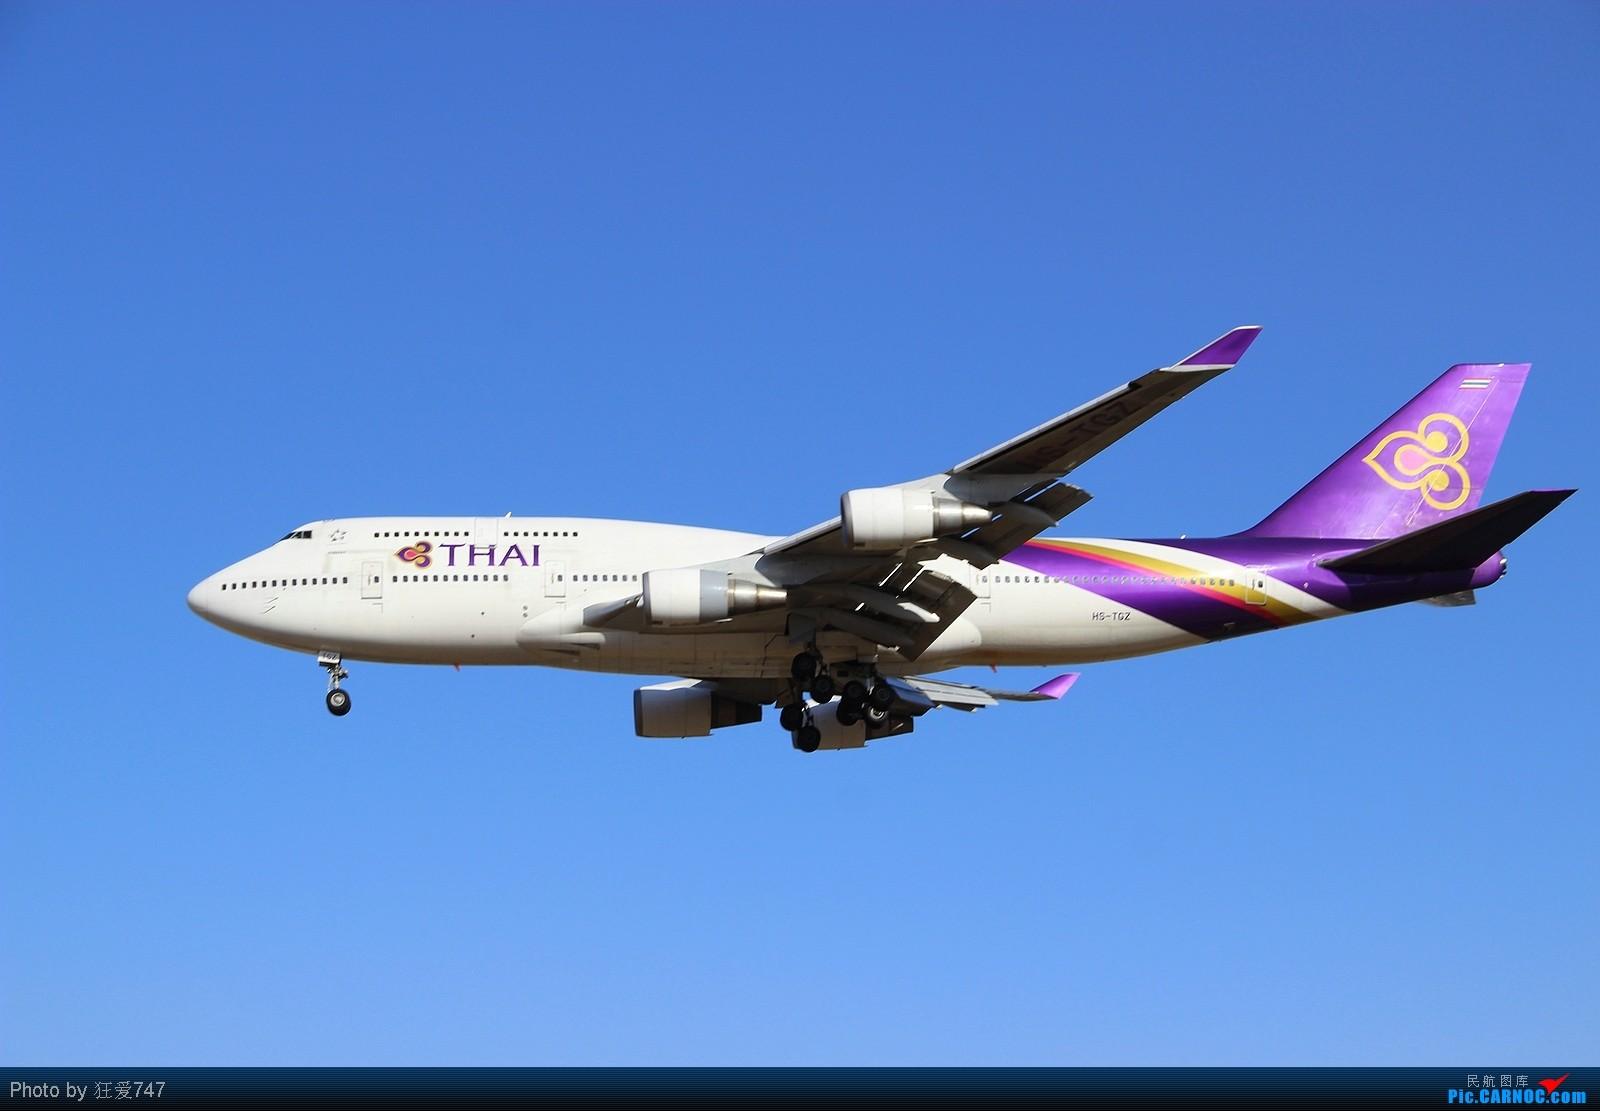 Re:[原创]今天转战西跑的一些收货。 BOEING 747-400 HS-TGZ 中国北京首都机场